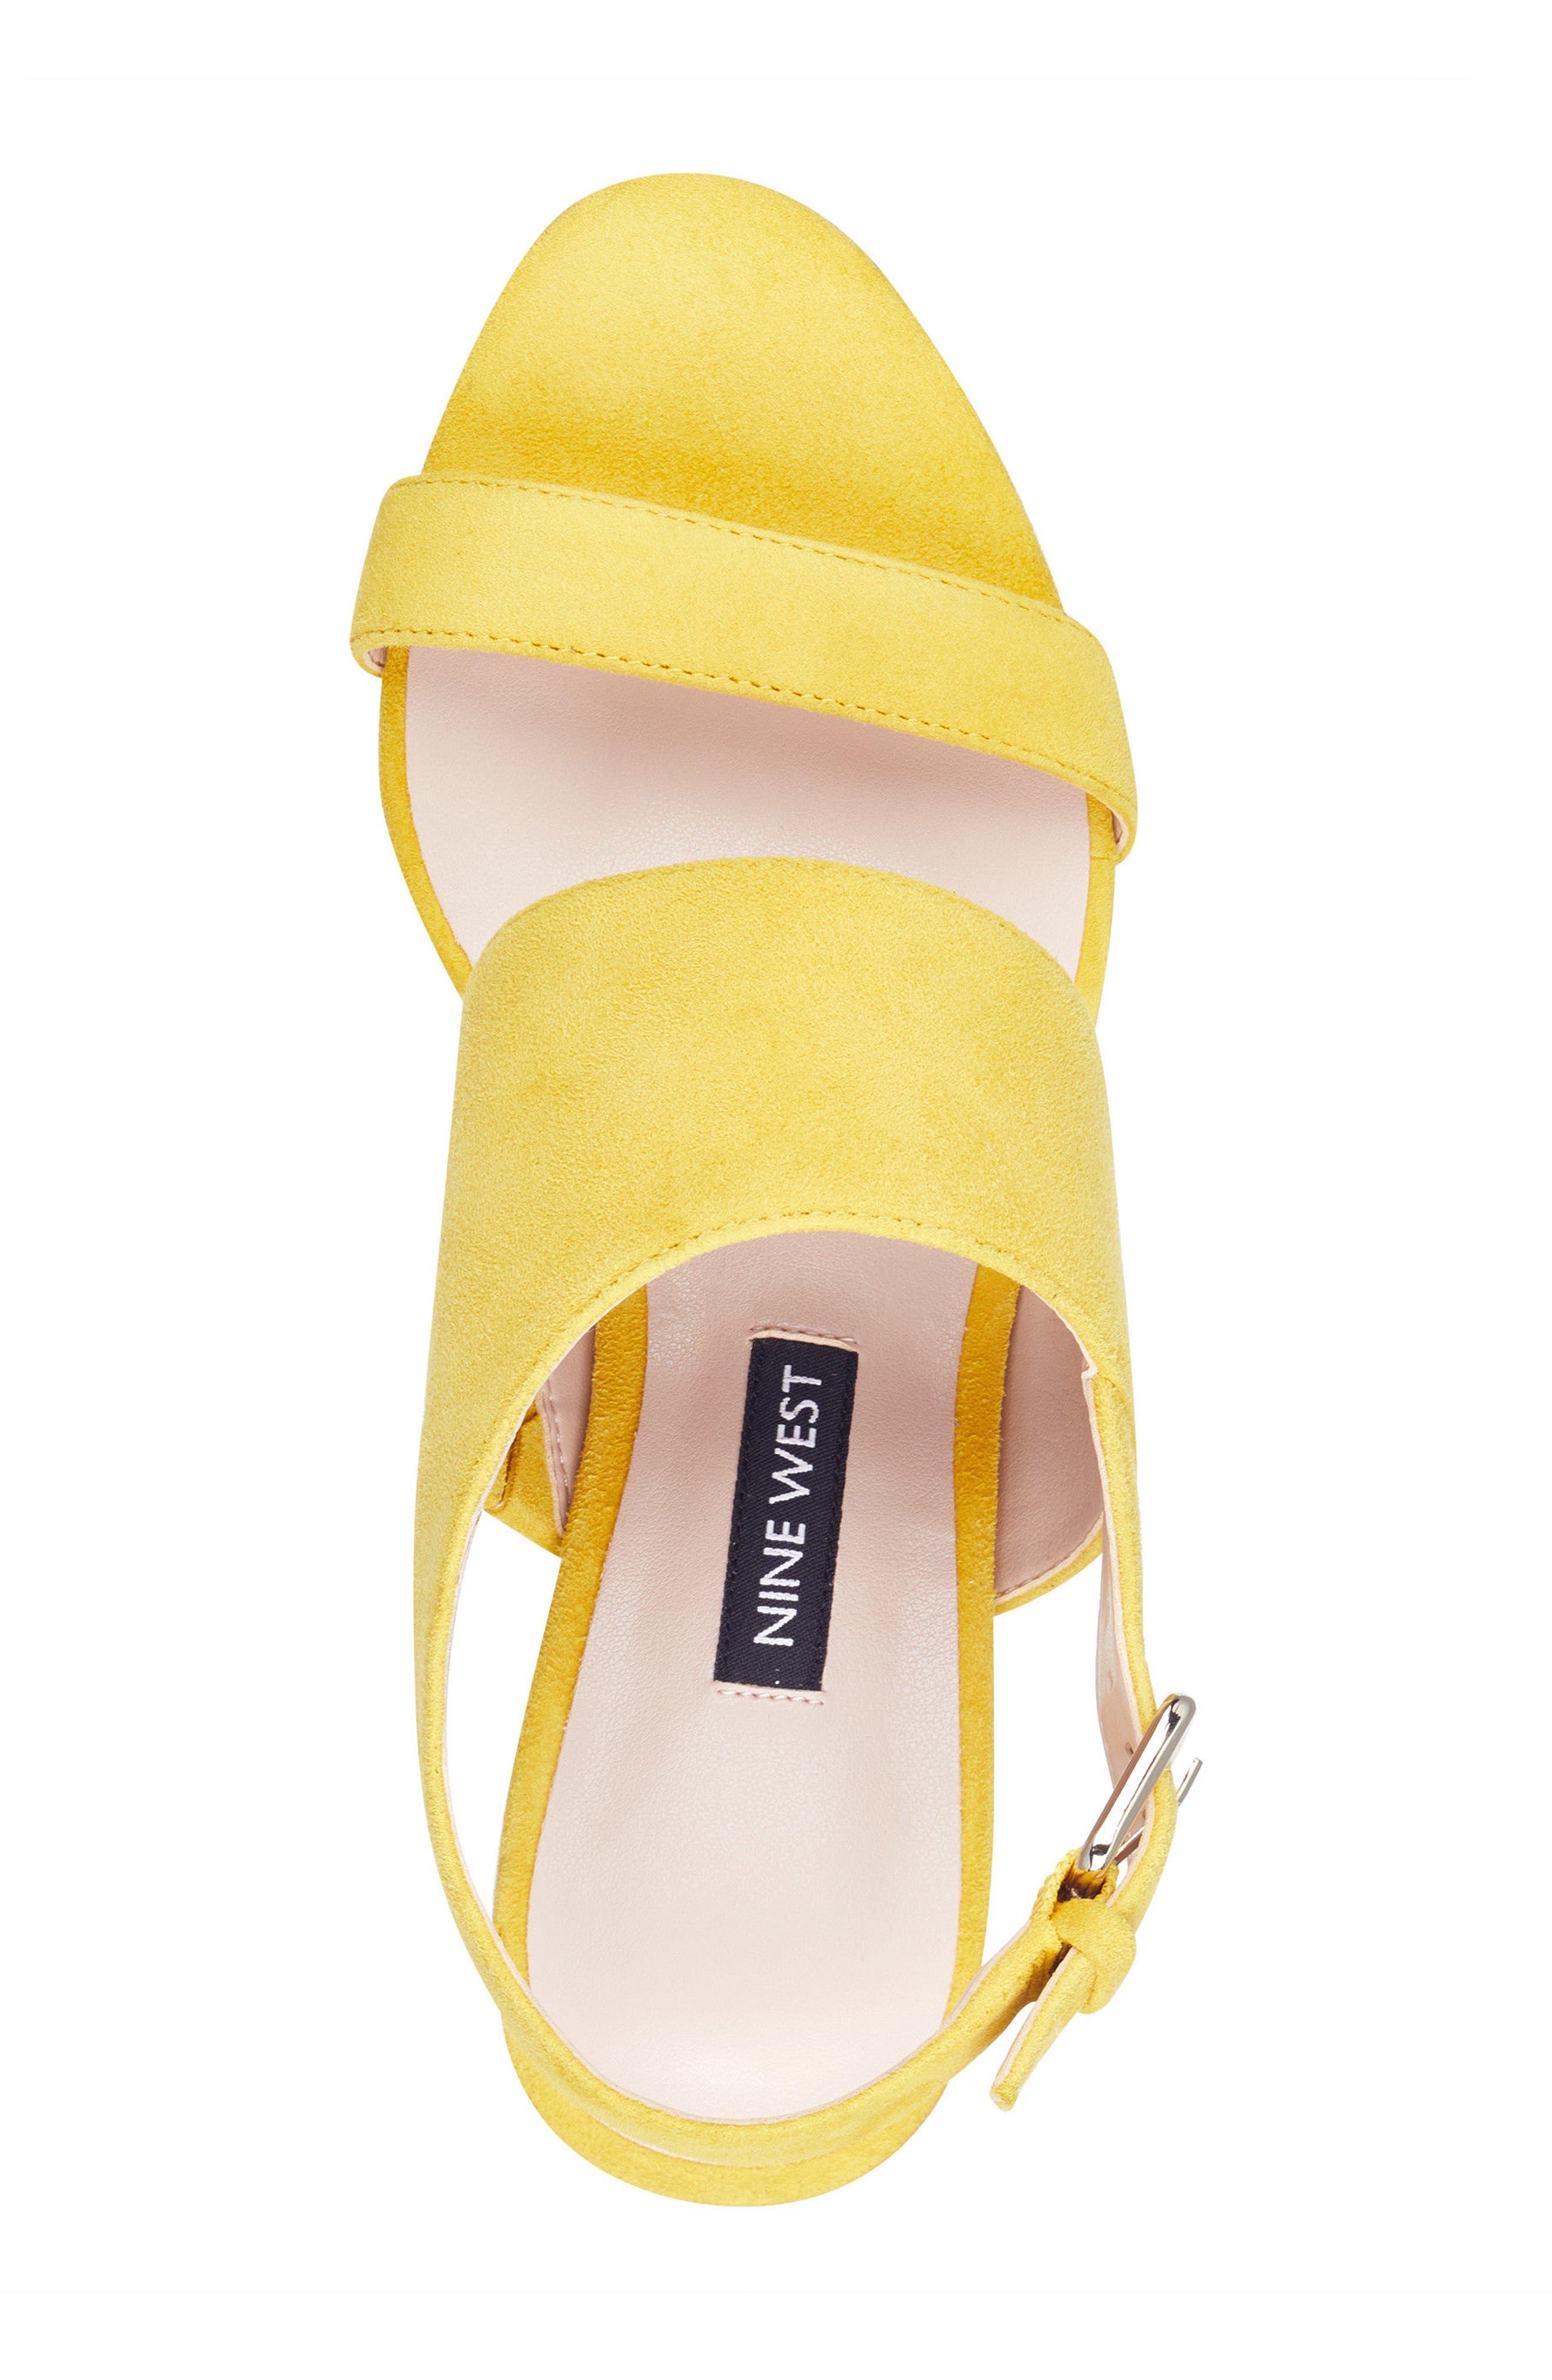 Forli Asymmetrical Sandal,                             Alternate thumbnail 5, color,                             Yellow Suede